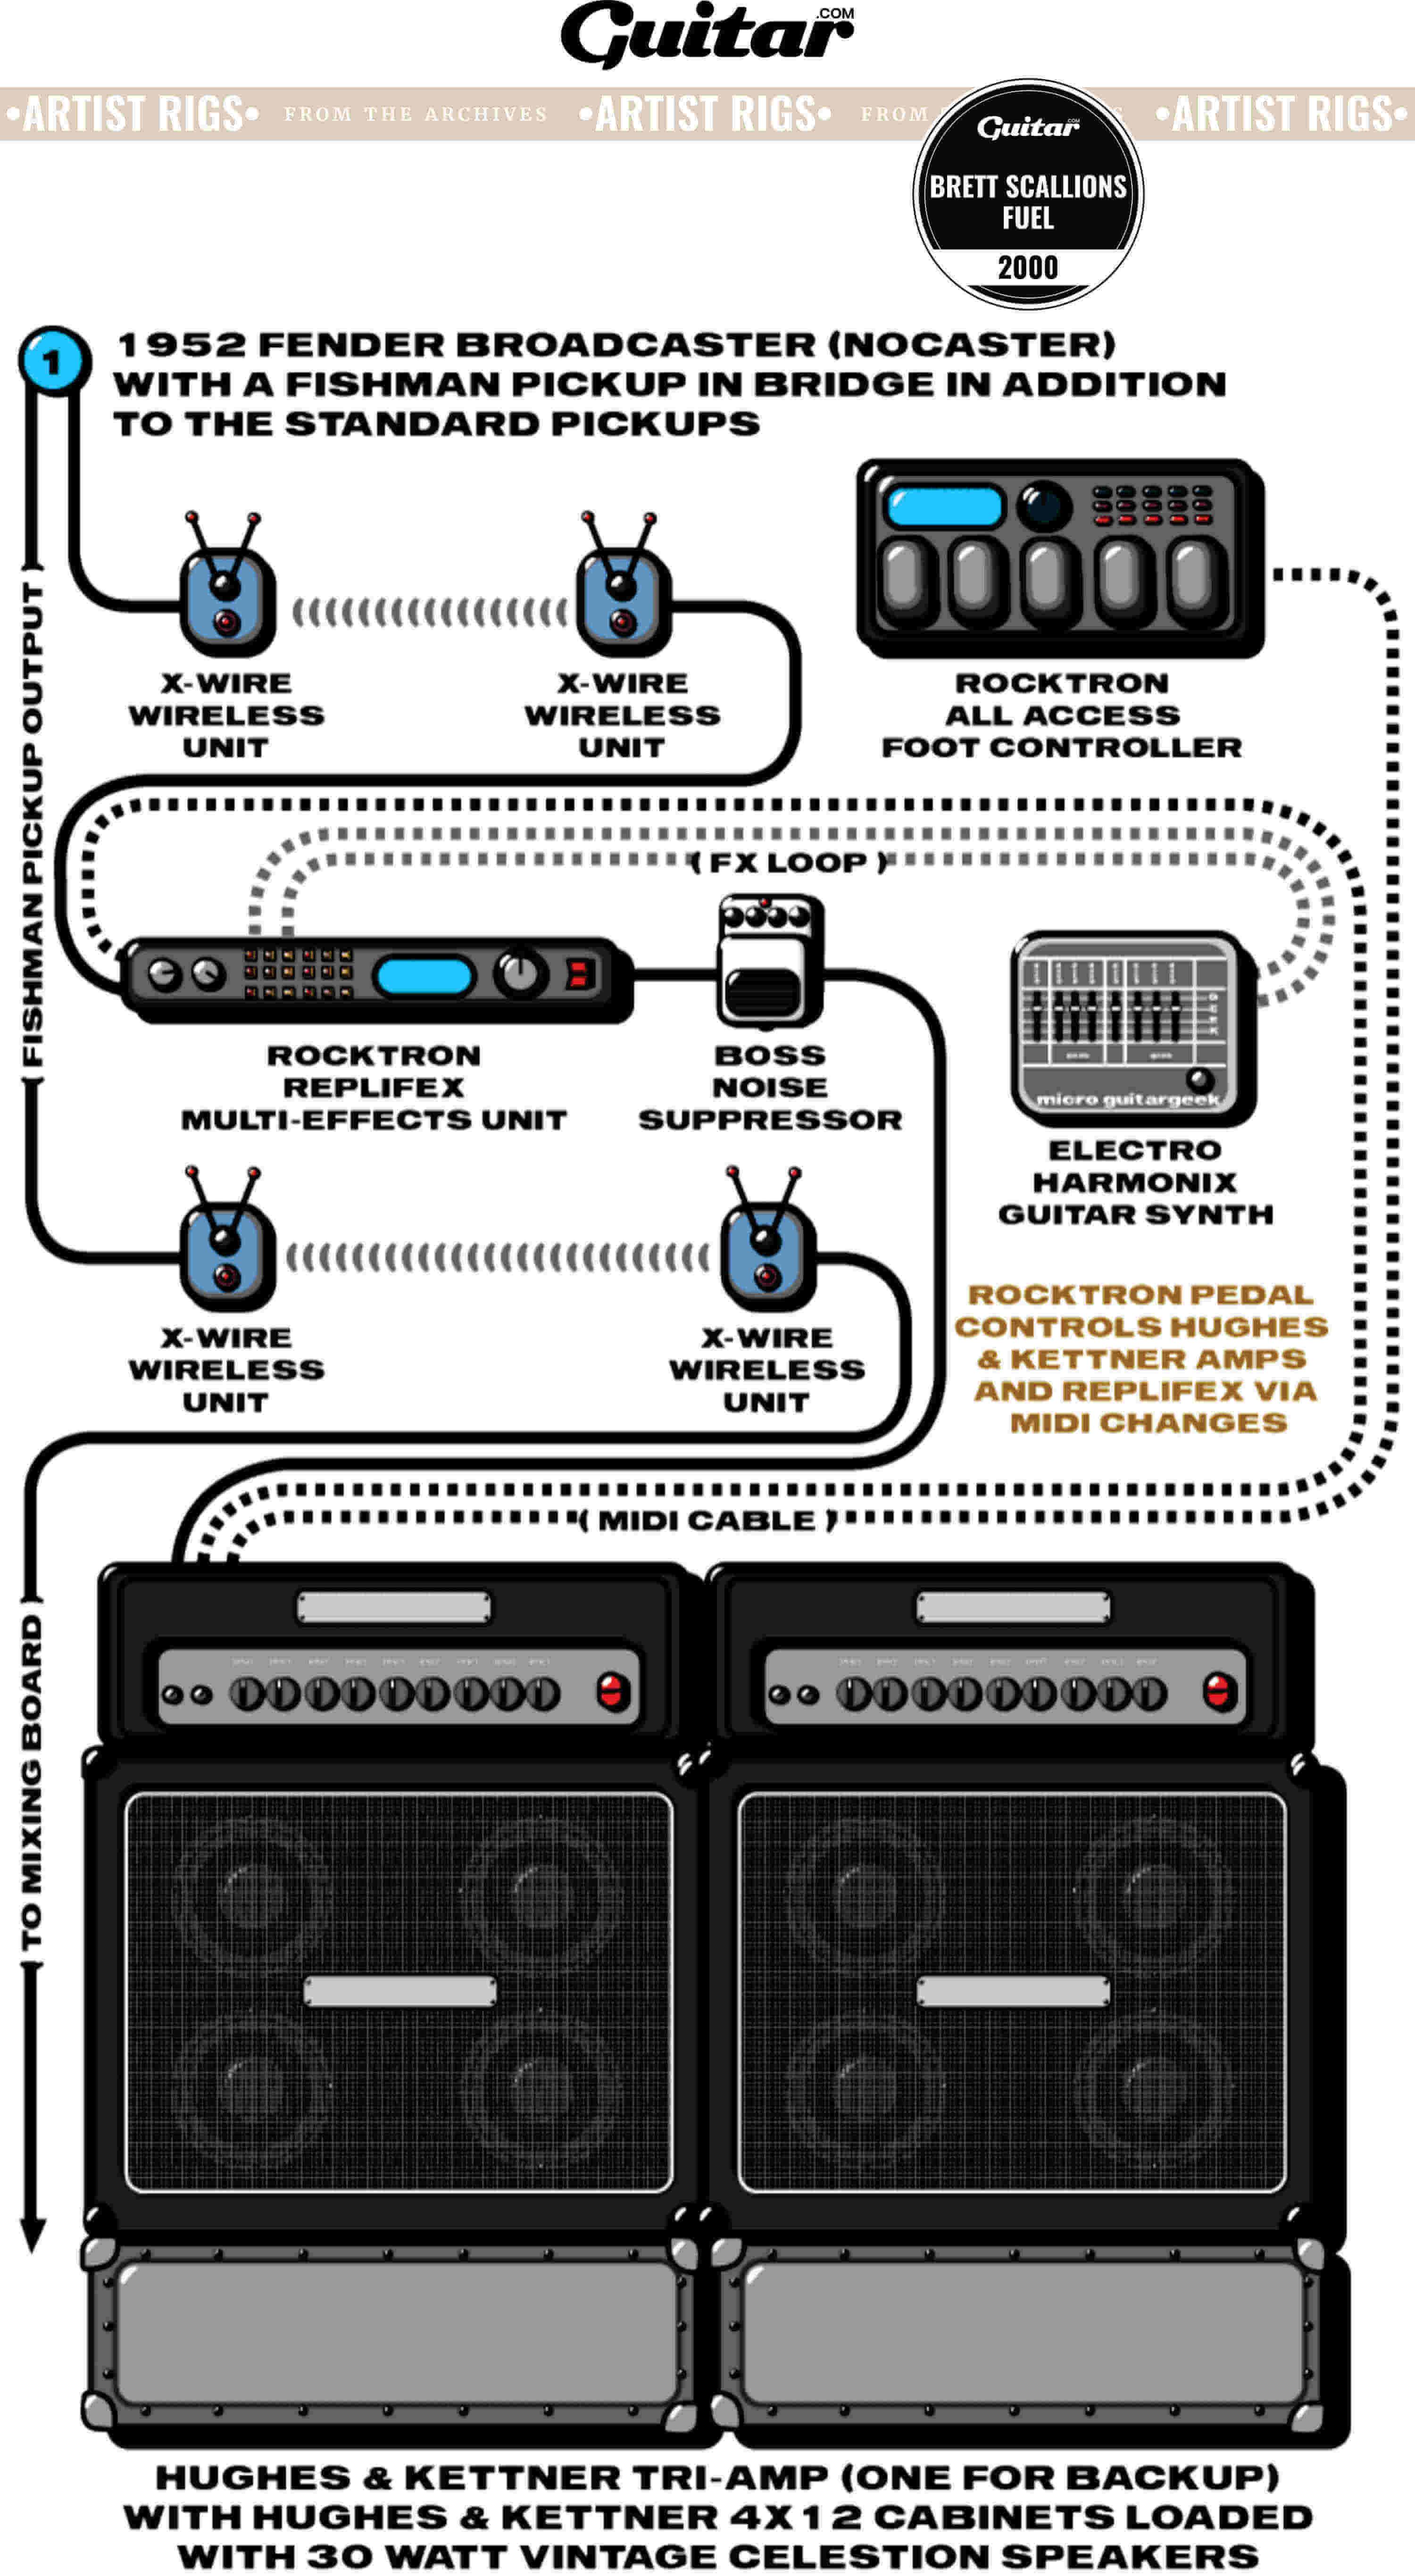 Rig Diagram: Brett Scallions, Fuel (2000)